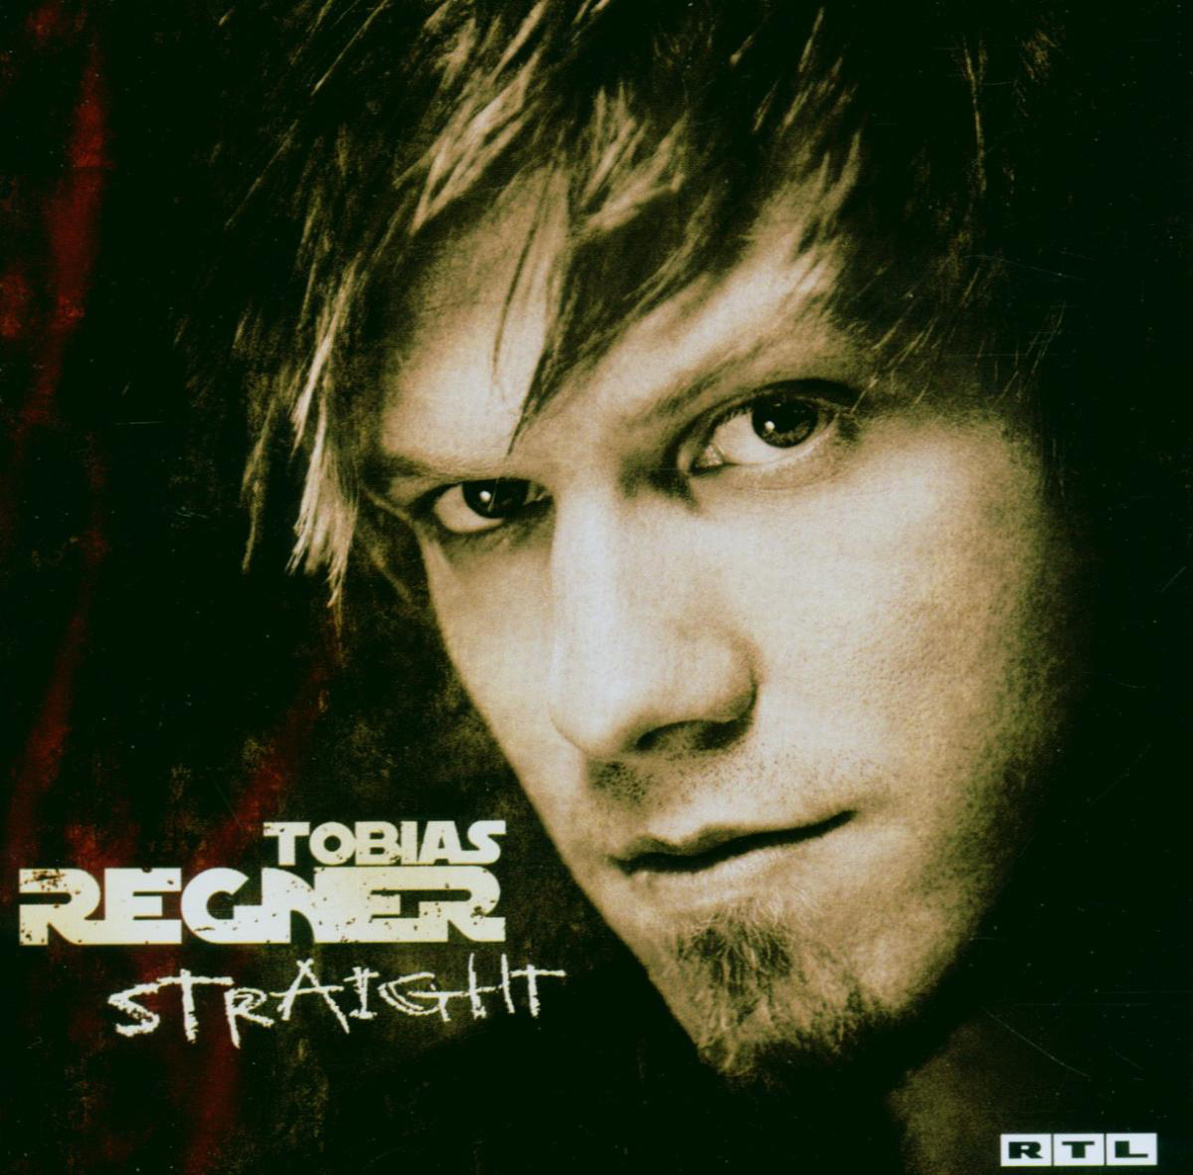 Tobias Regner - Straight (Standard Edition)